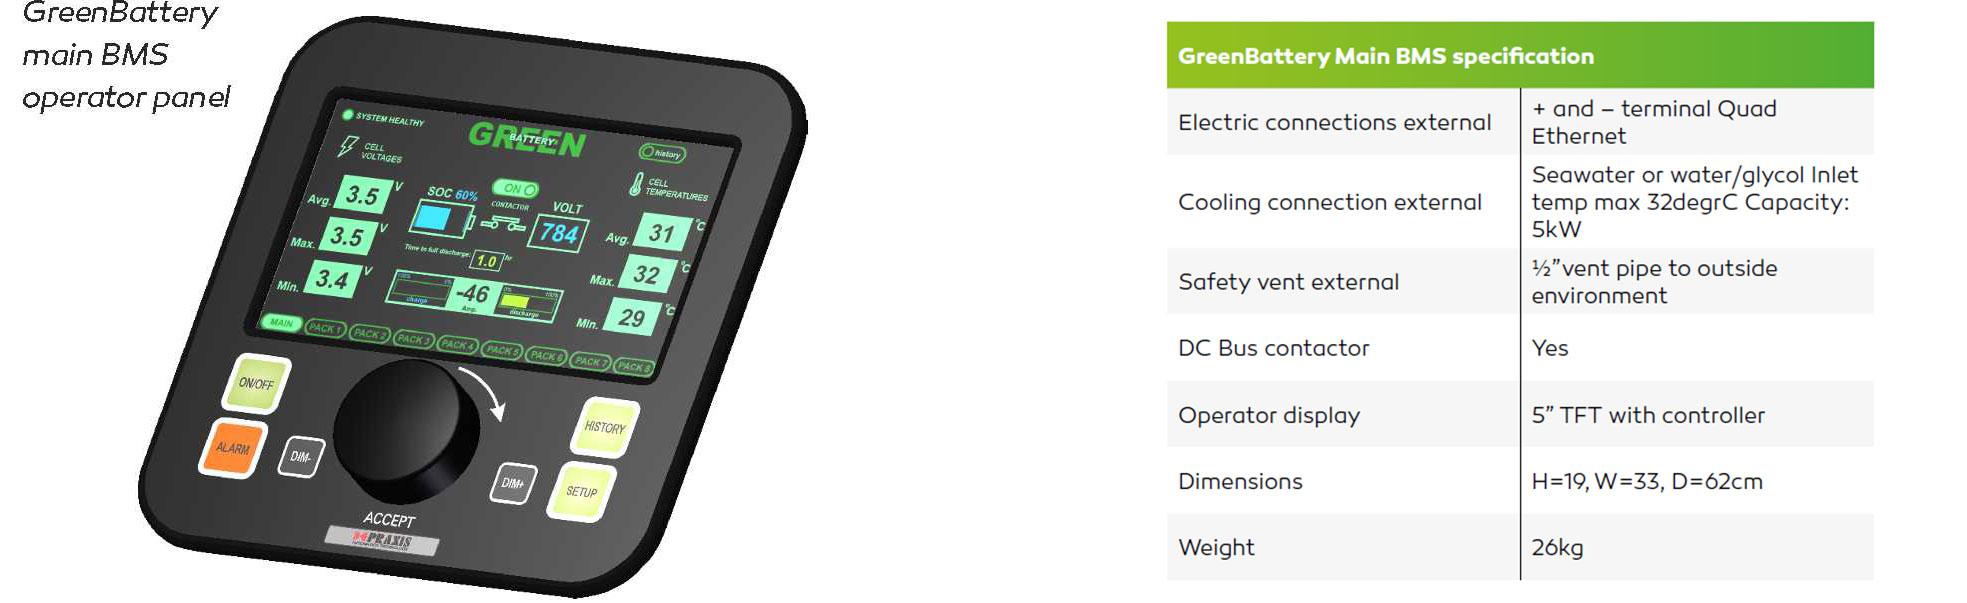 greenbattery